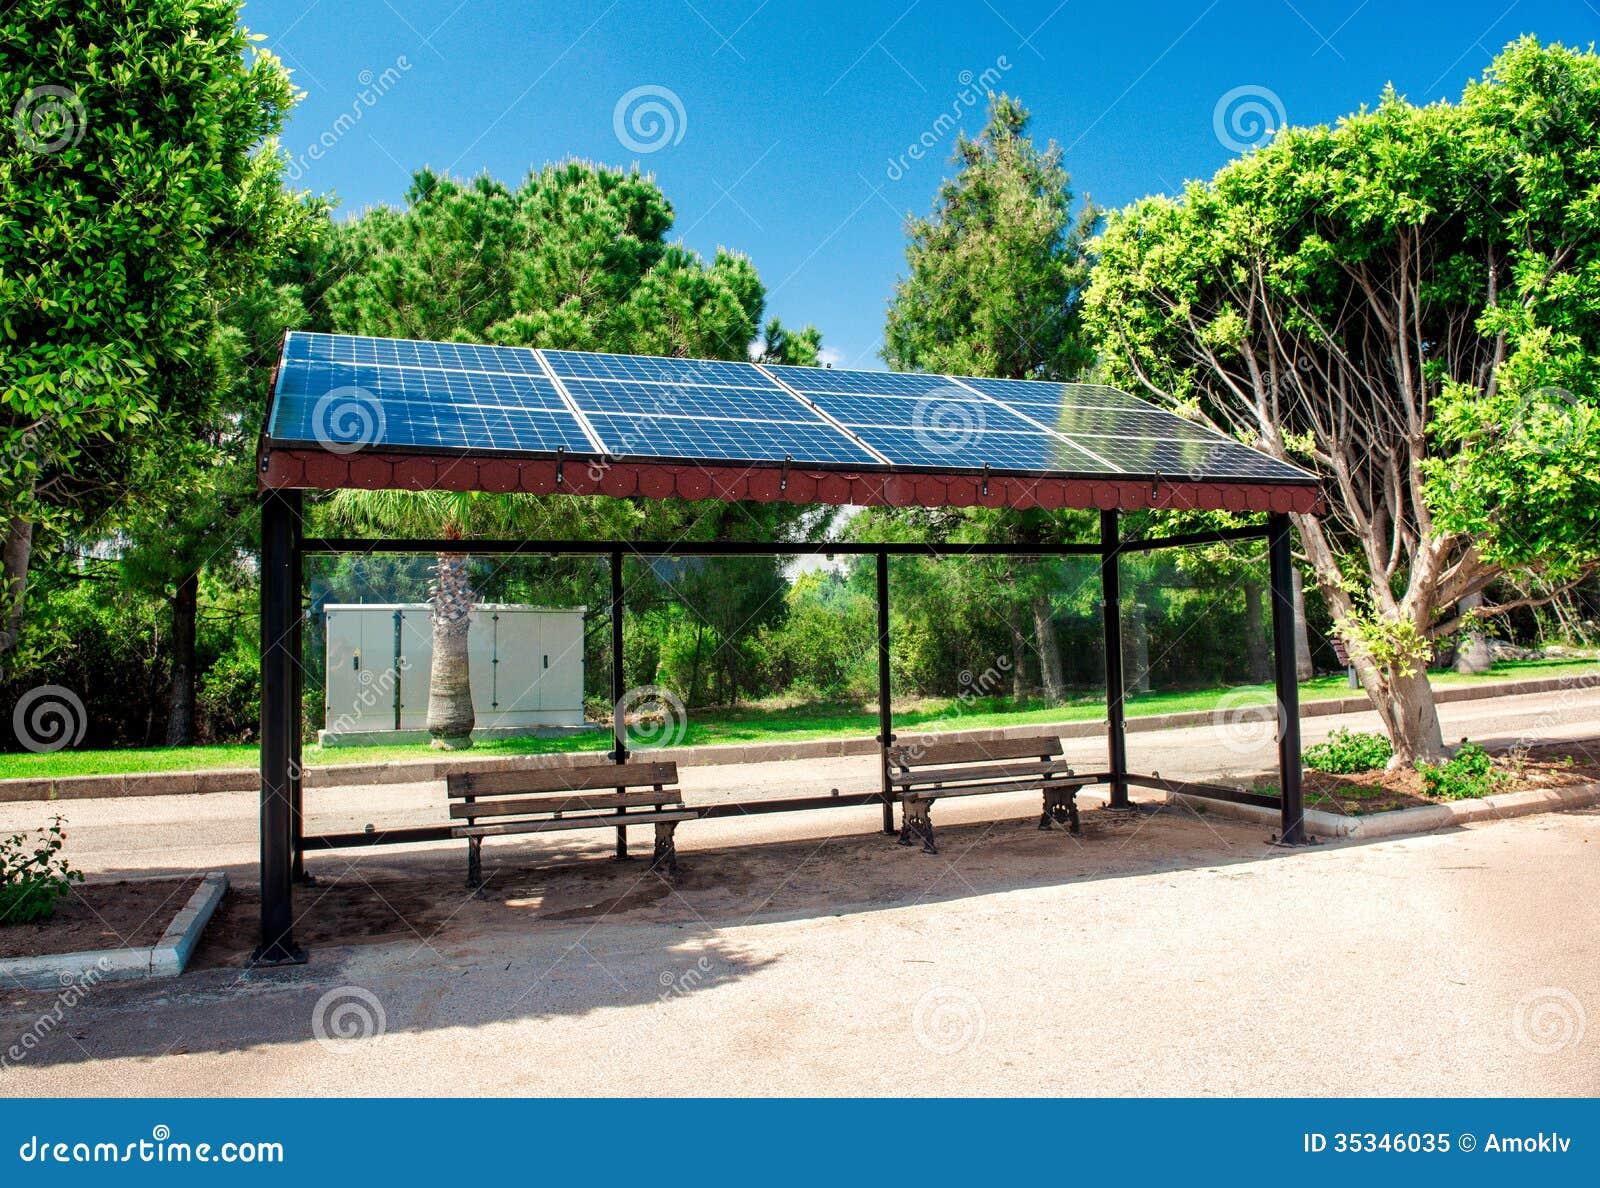 Solar Bus Stop Royalty Free Stock Photo - Image: 35346035